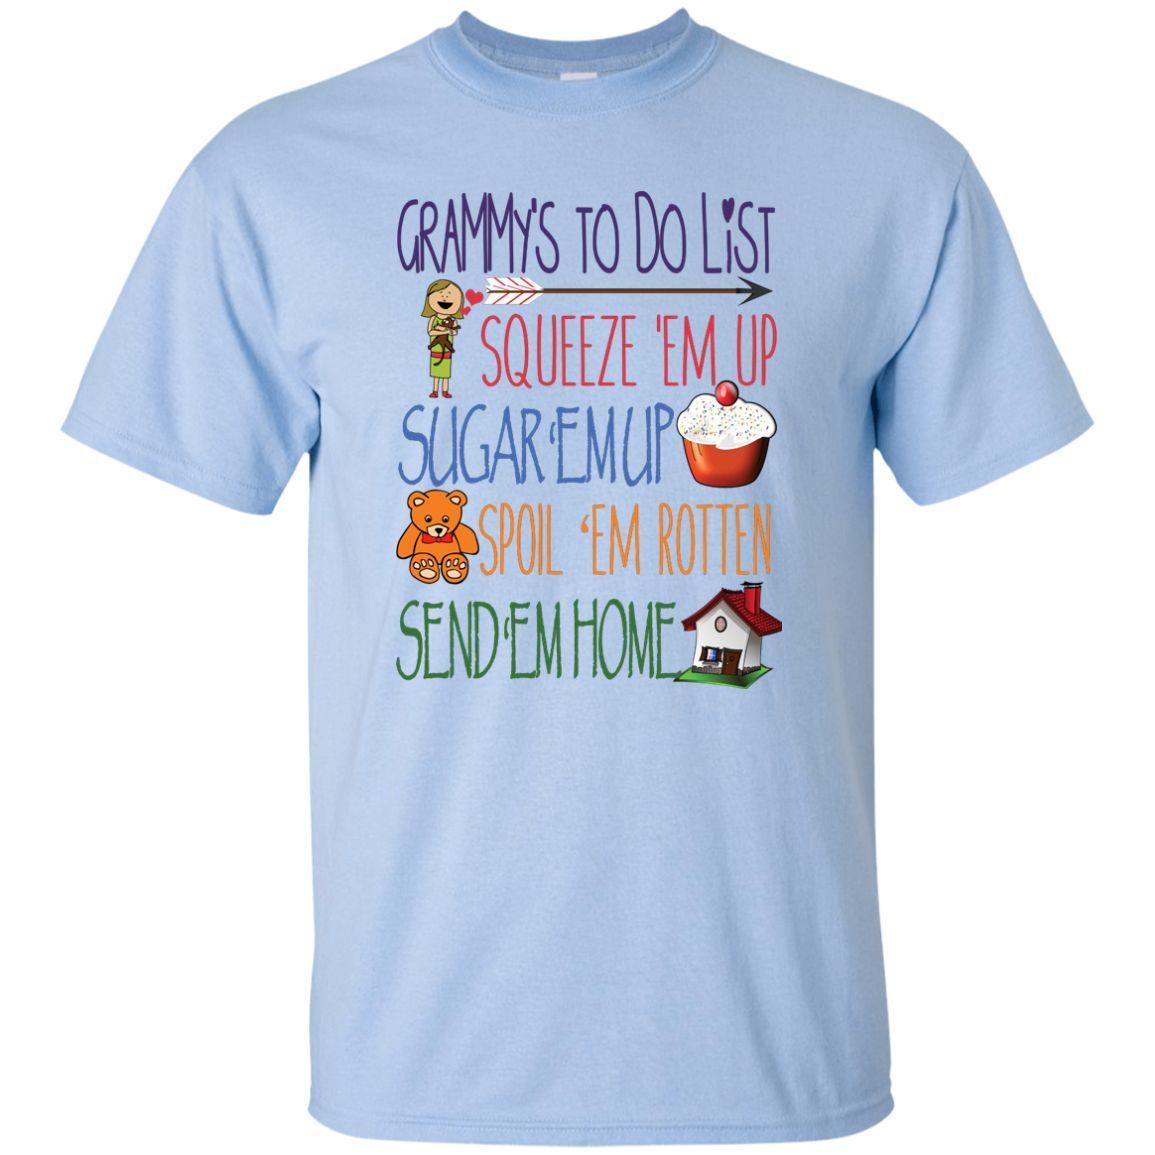 Grammy's ToDo List T-Shirts